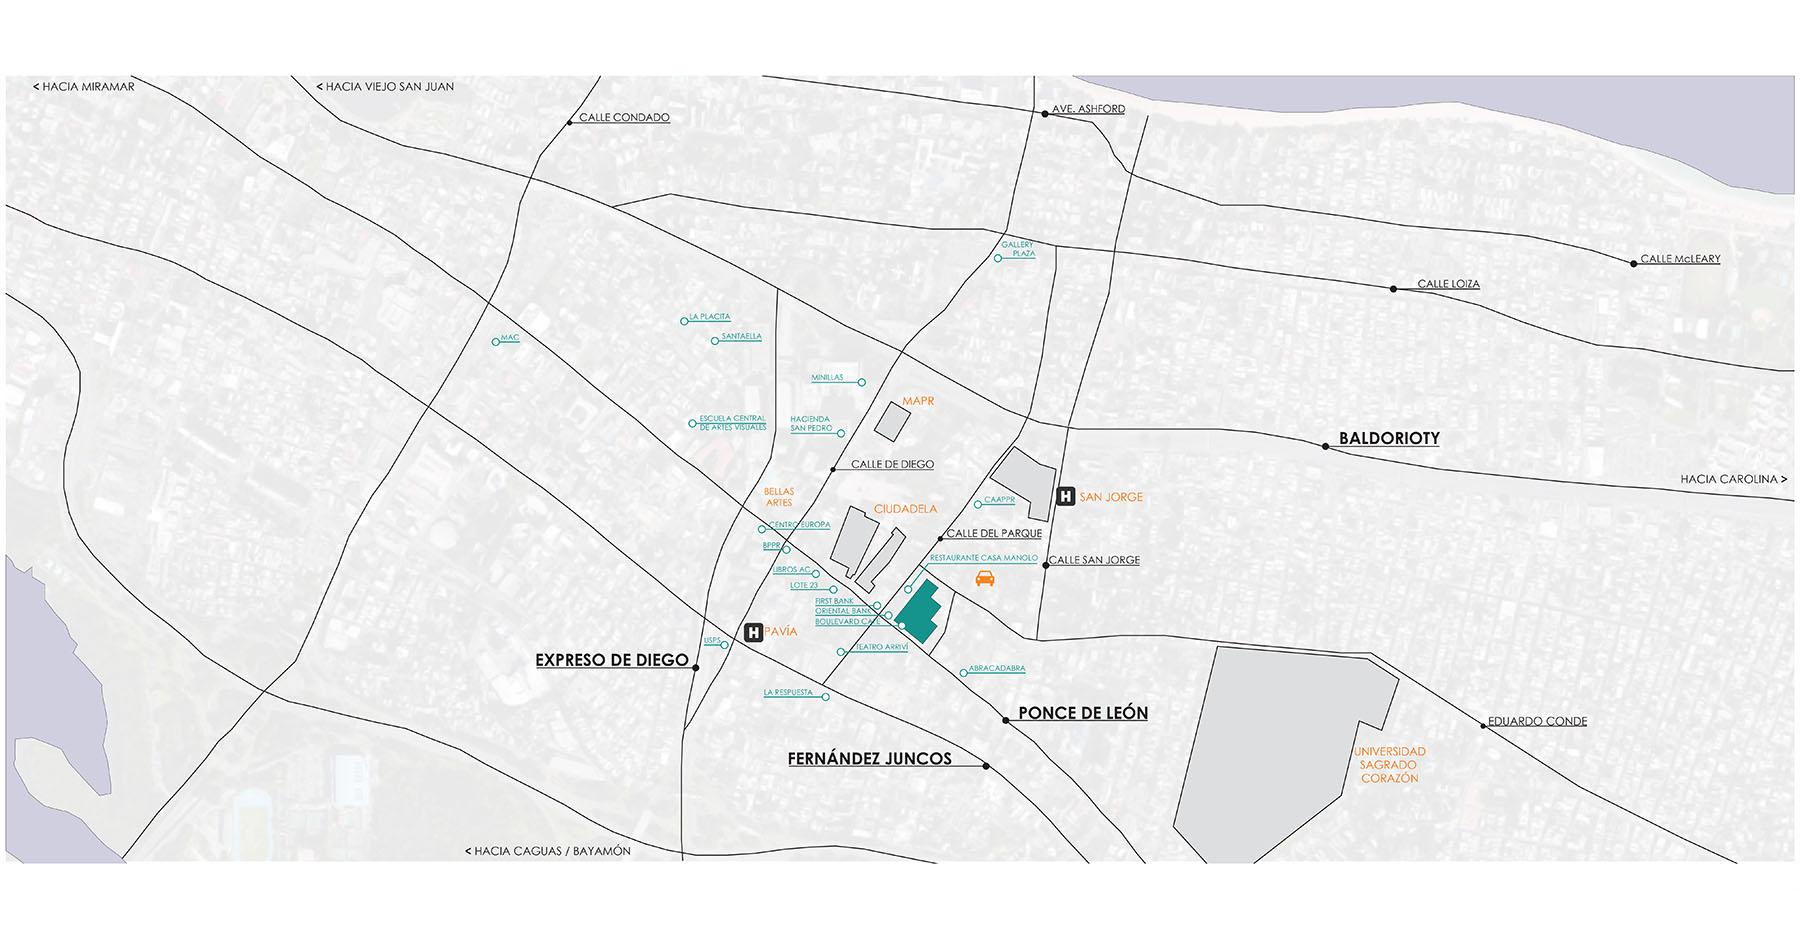 Cobians-Plaza-Mapa-web.jpg